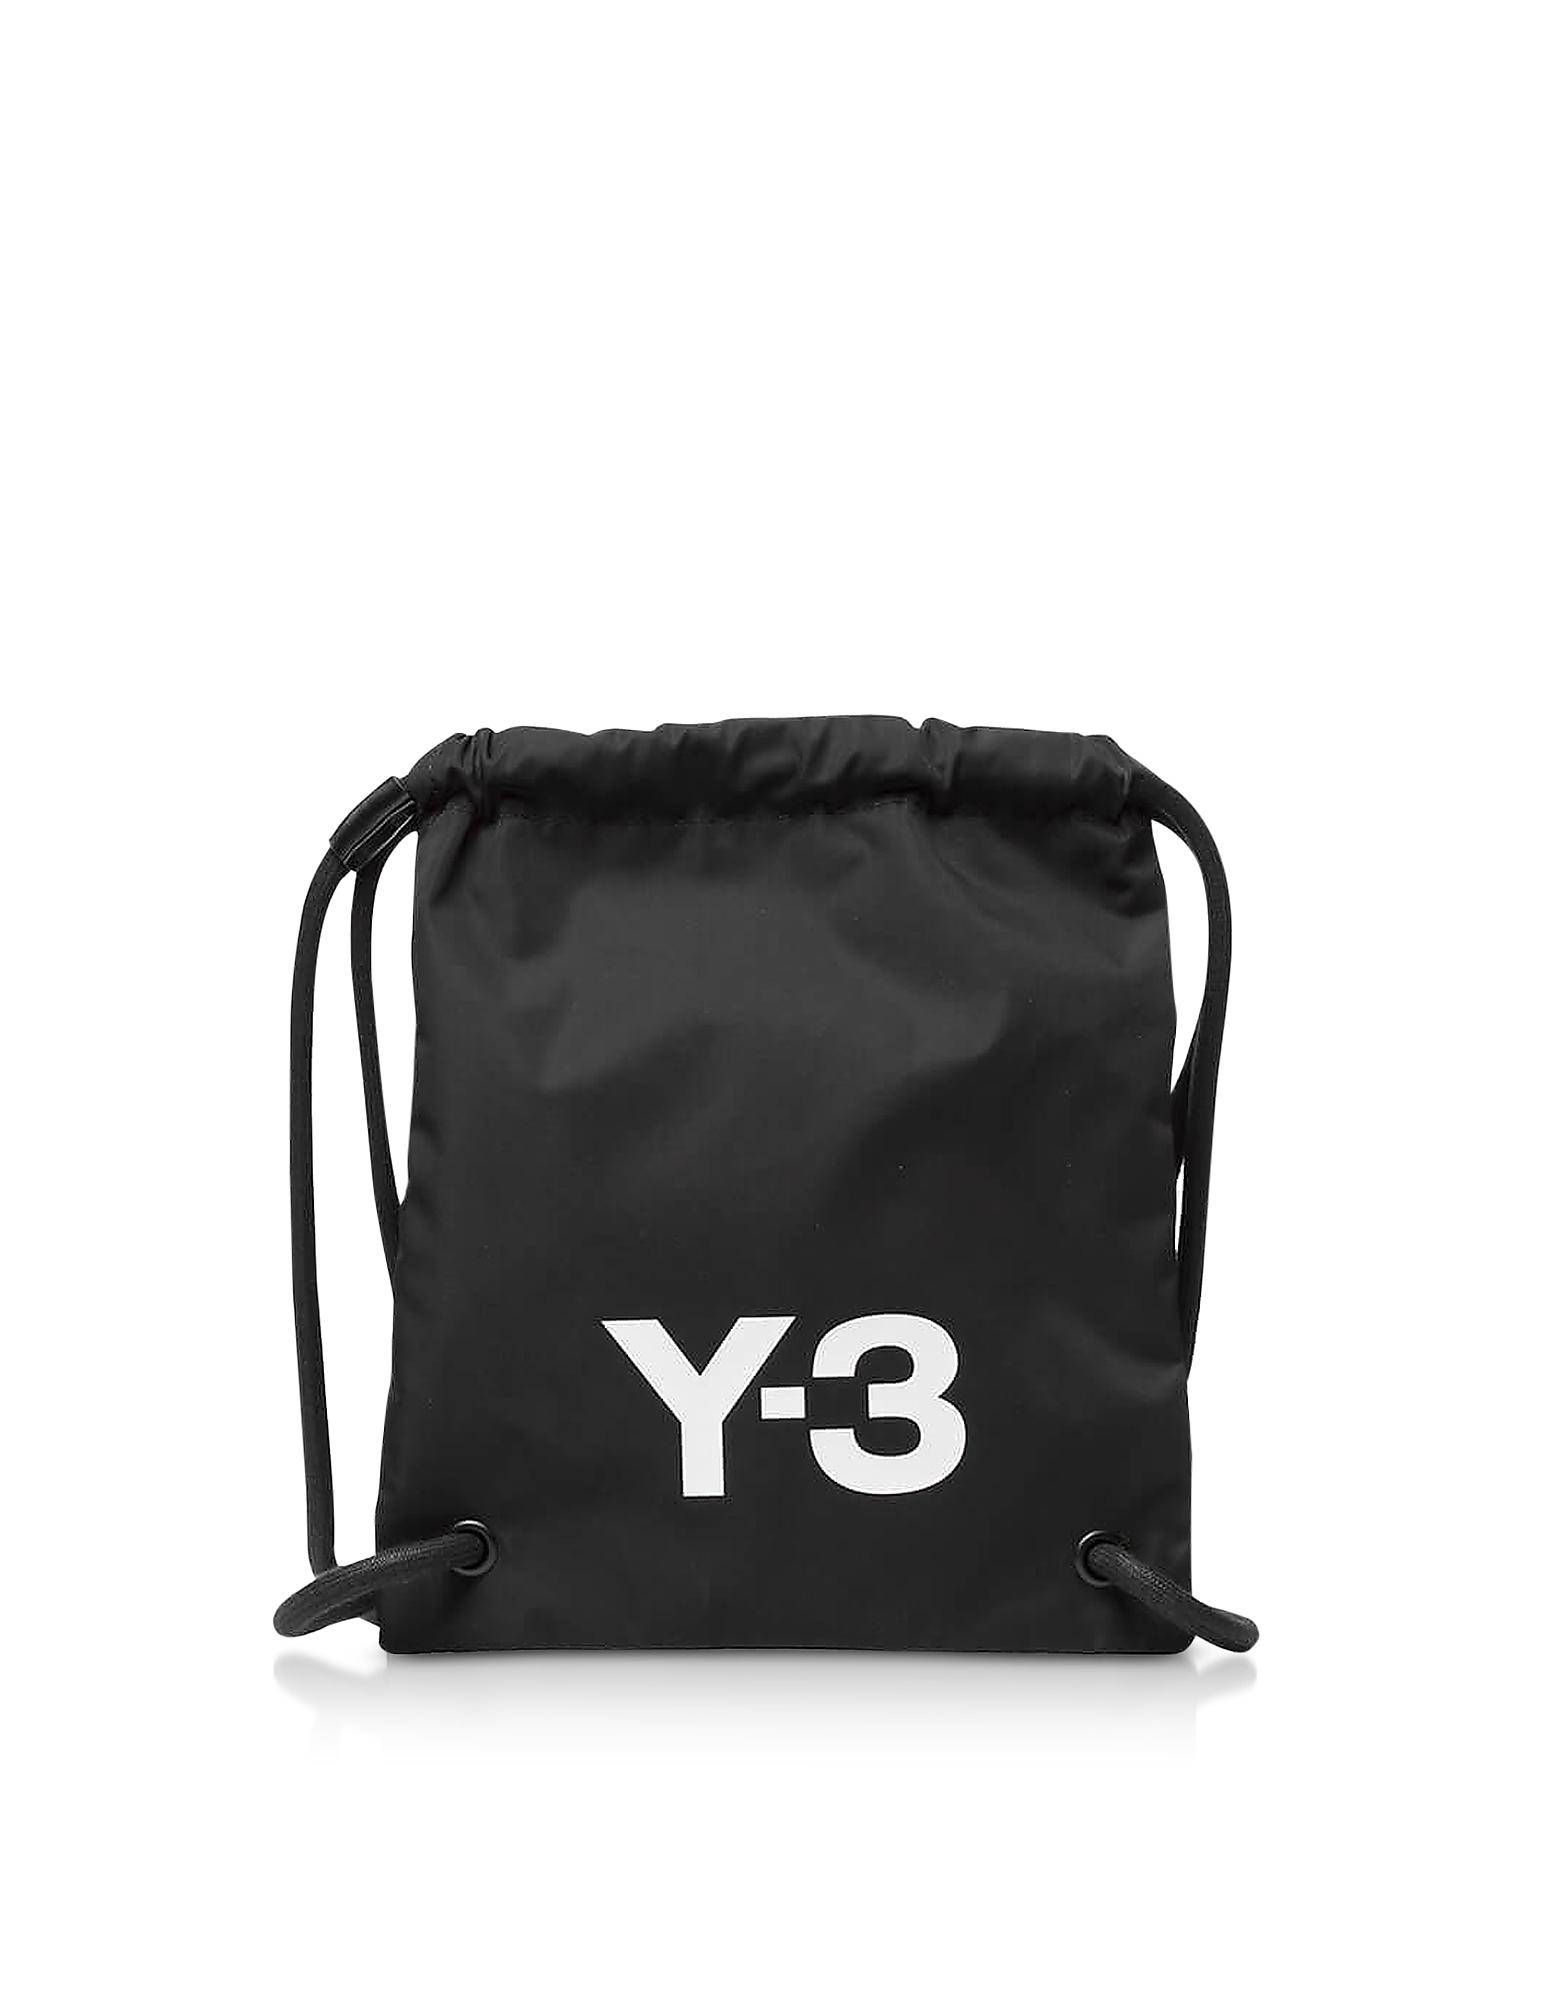 Y-3 Backpacks, Signature Mini Gym Bag